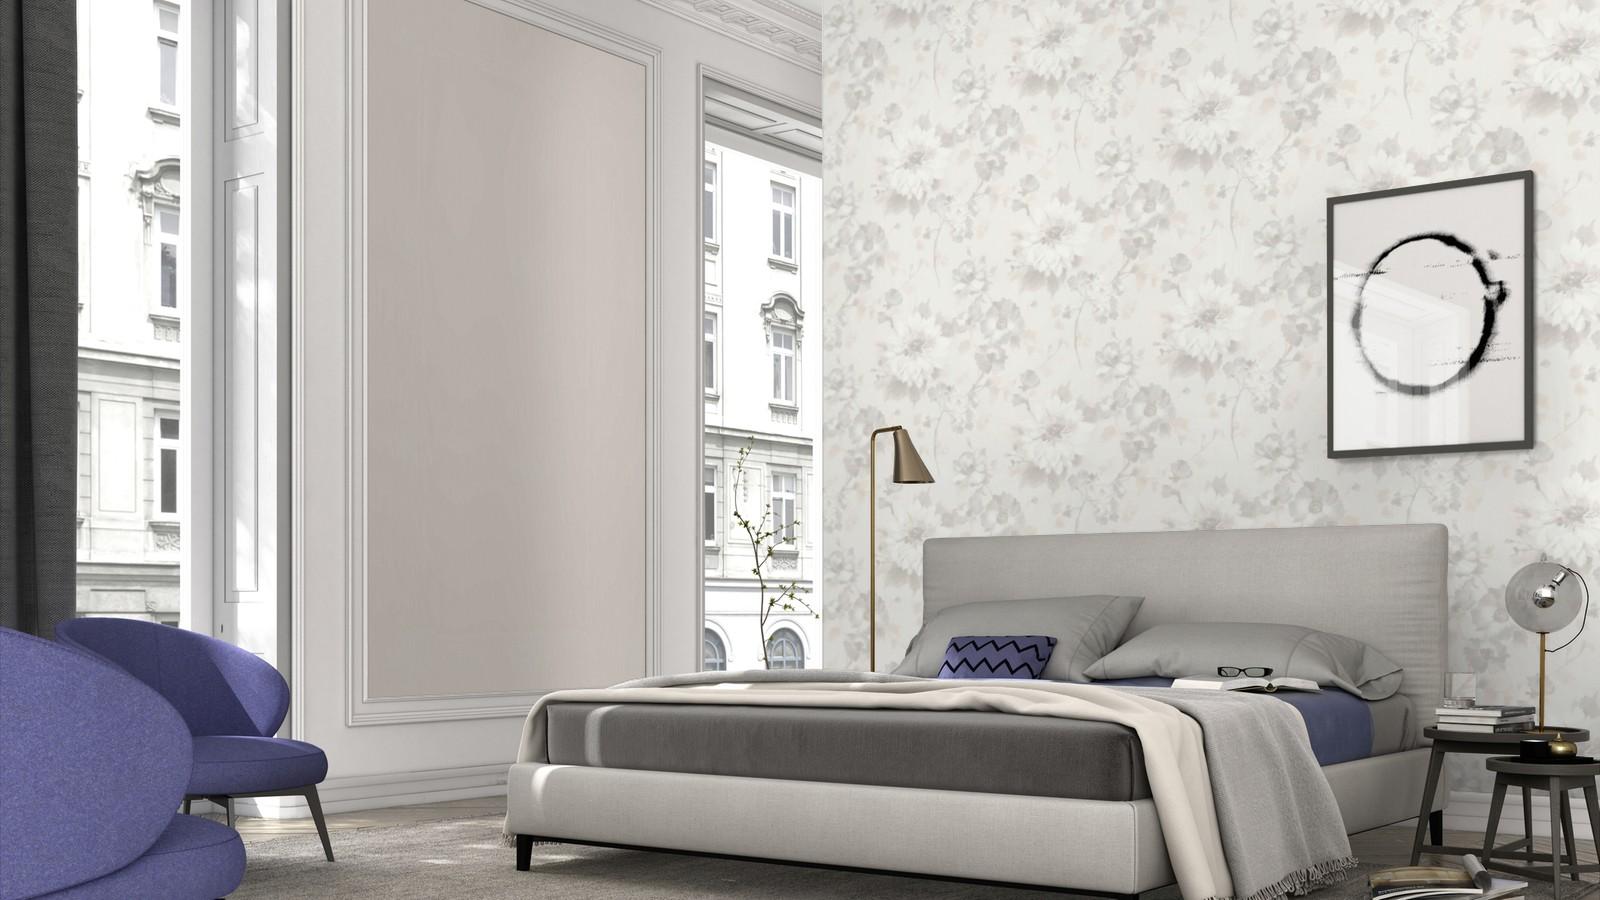 Обои Erismann GMK Fashion for Walls New 10051-14 (Эрисман)